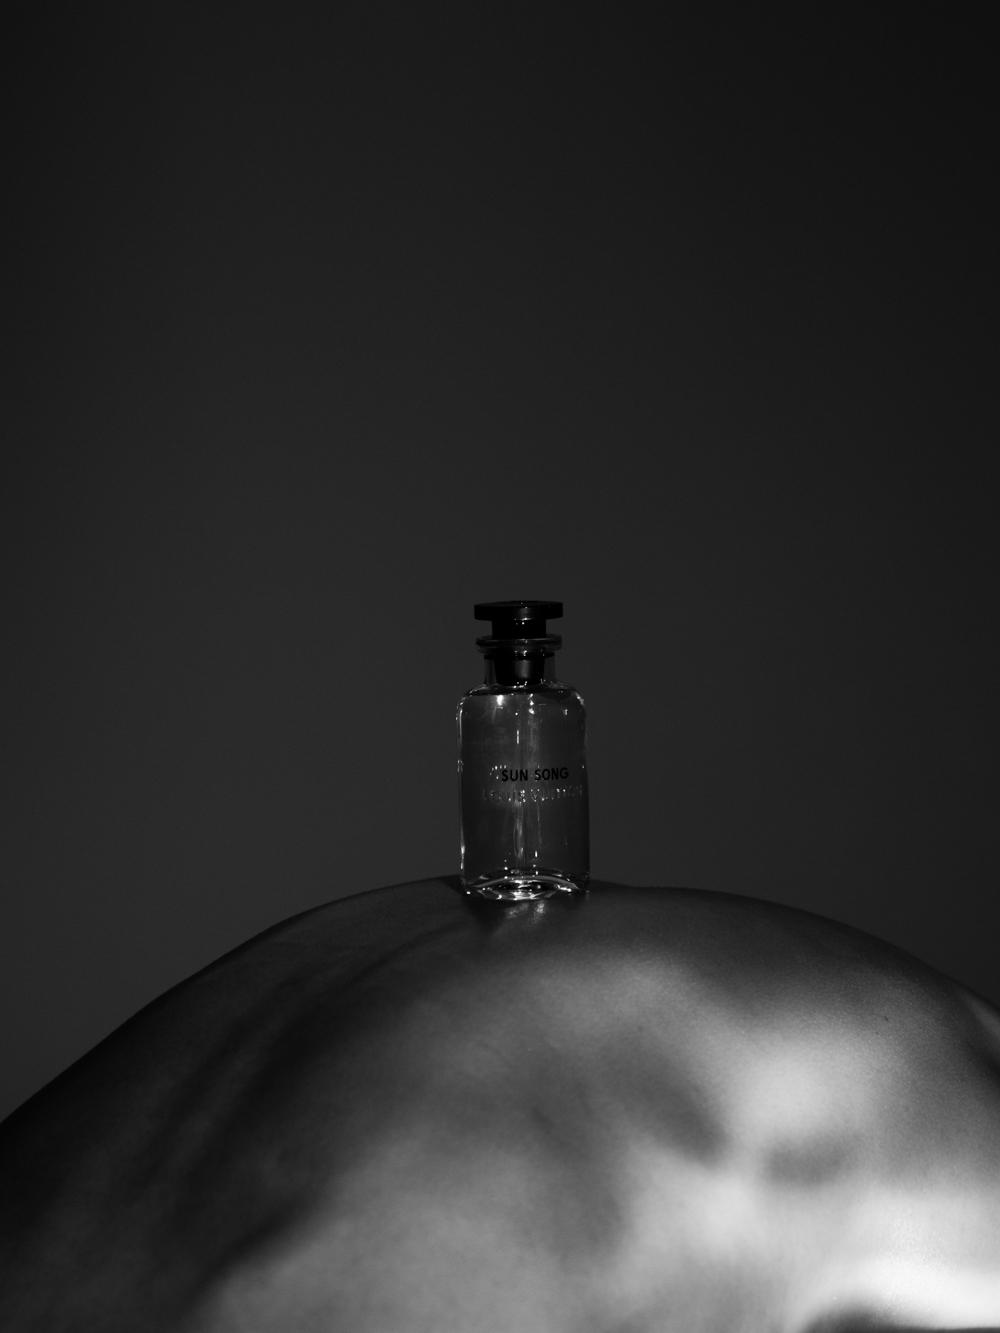 Ближе к телу: специальная съемка Louis Vuitton x BURO. (фото 23)